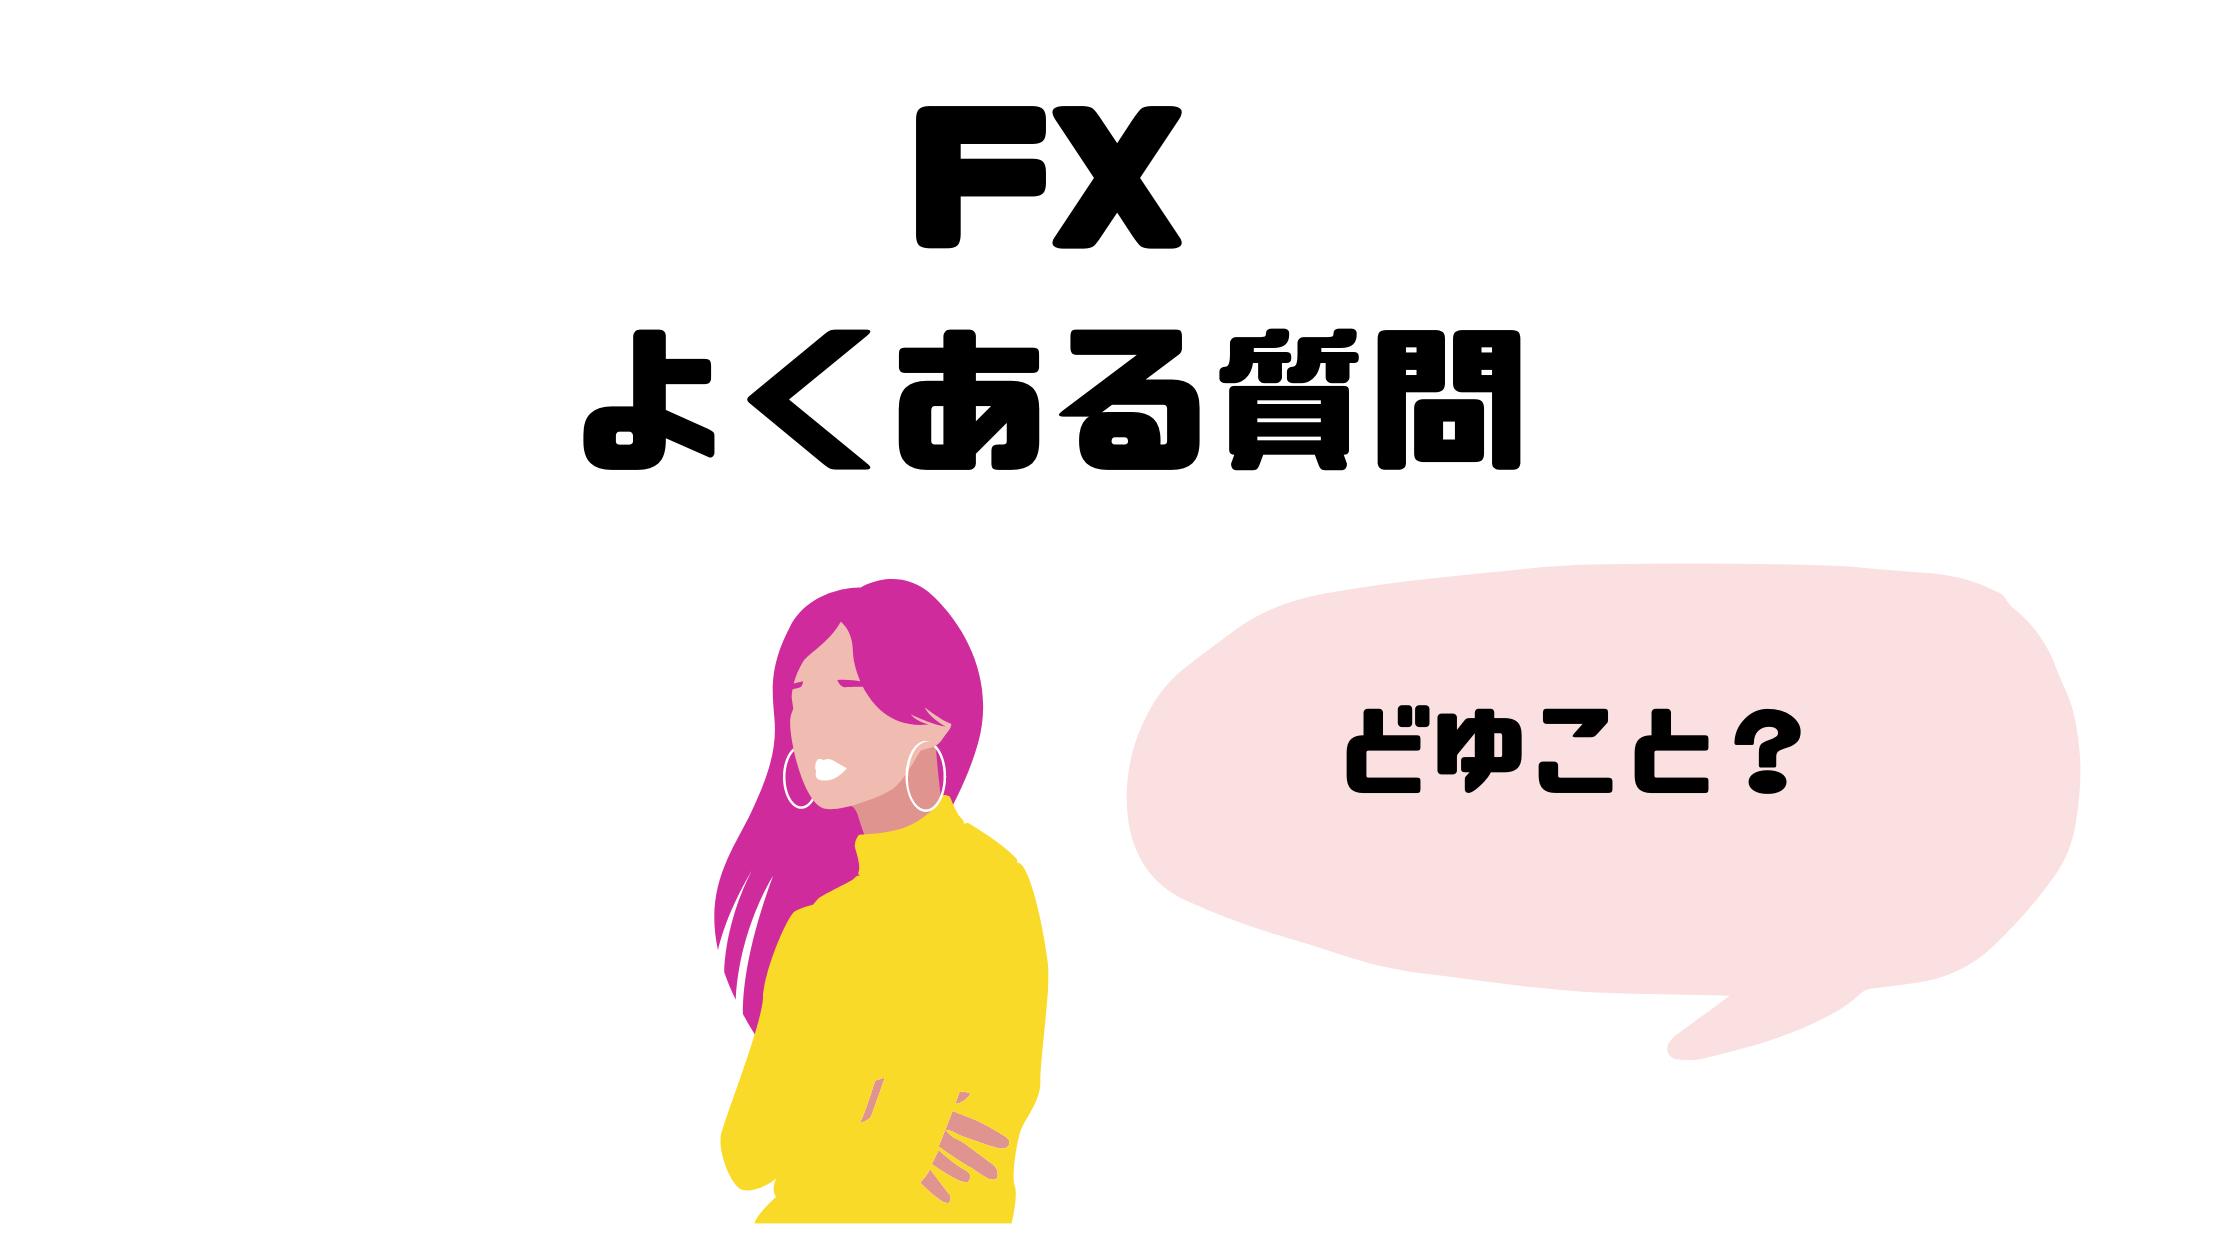 FX_よくある質問